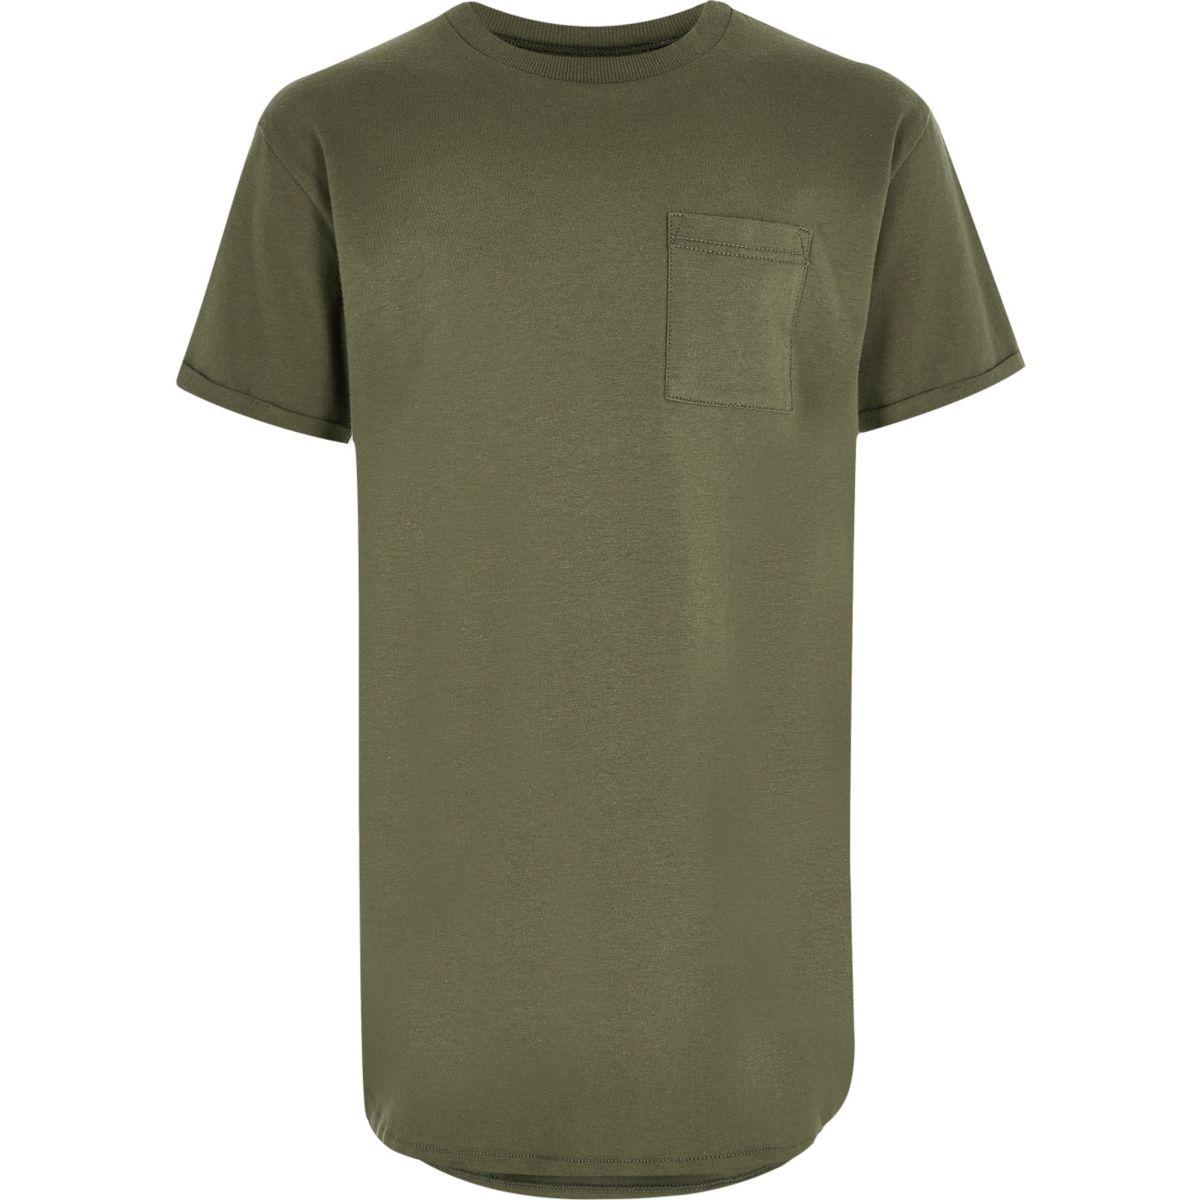 T-shirt vert kaki à ourlet arrondi pour garçon